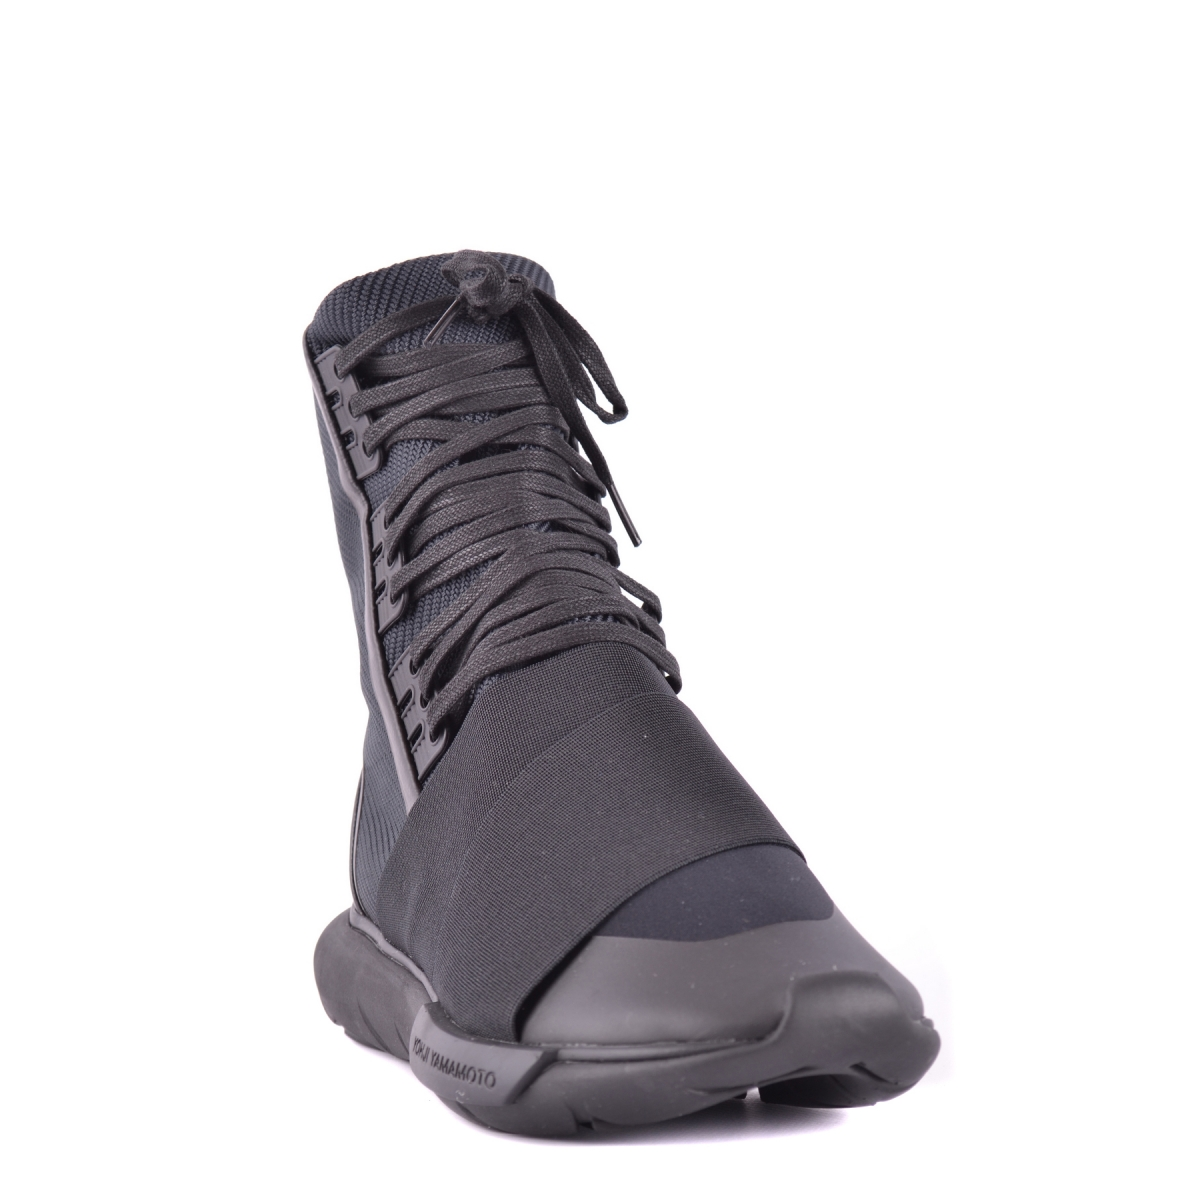 quality design 07eaf db0a2 ... Adidas Y-3 Yohji Yamamoto. Prezzo scontato! Sneakers alte QASA BOOT.  Precedente. Sneakers alte QASA BOOT · Sneakers alte QASA BOOT ...